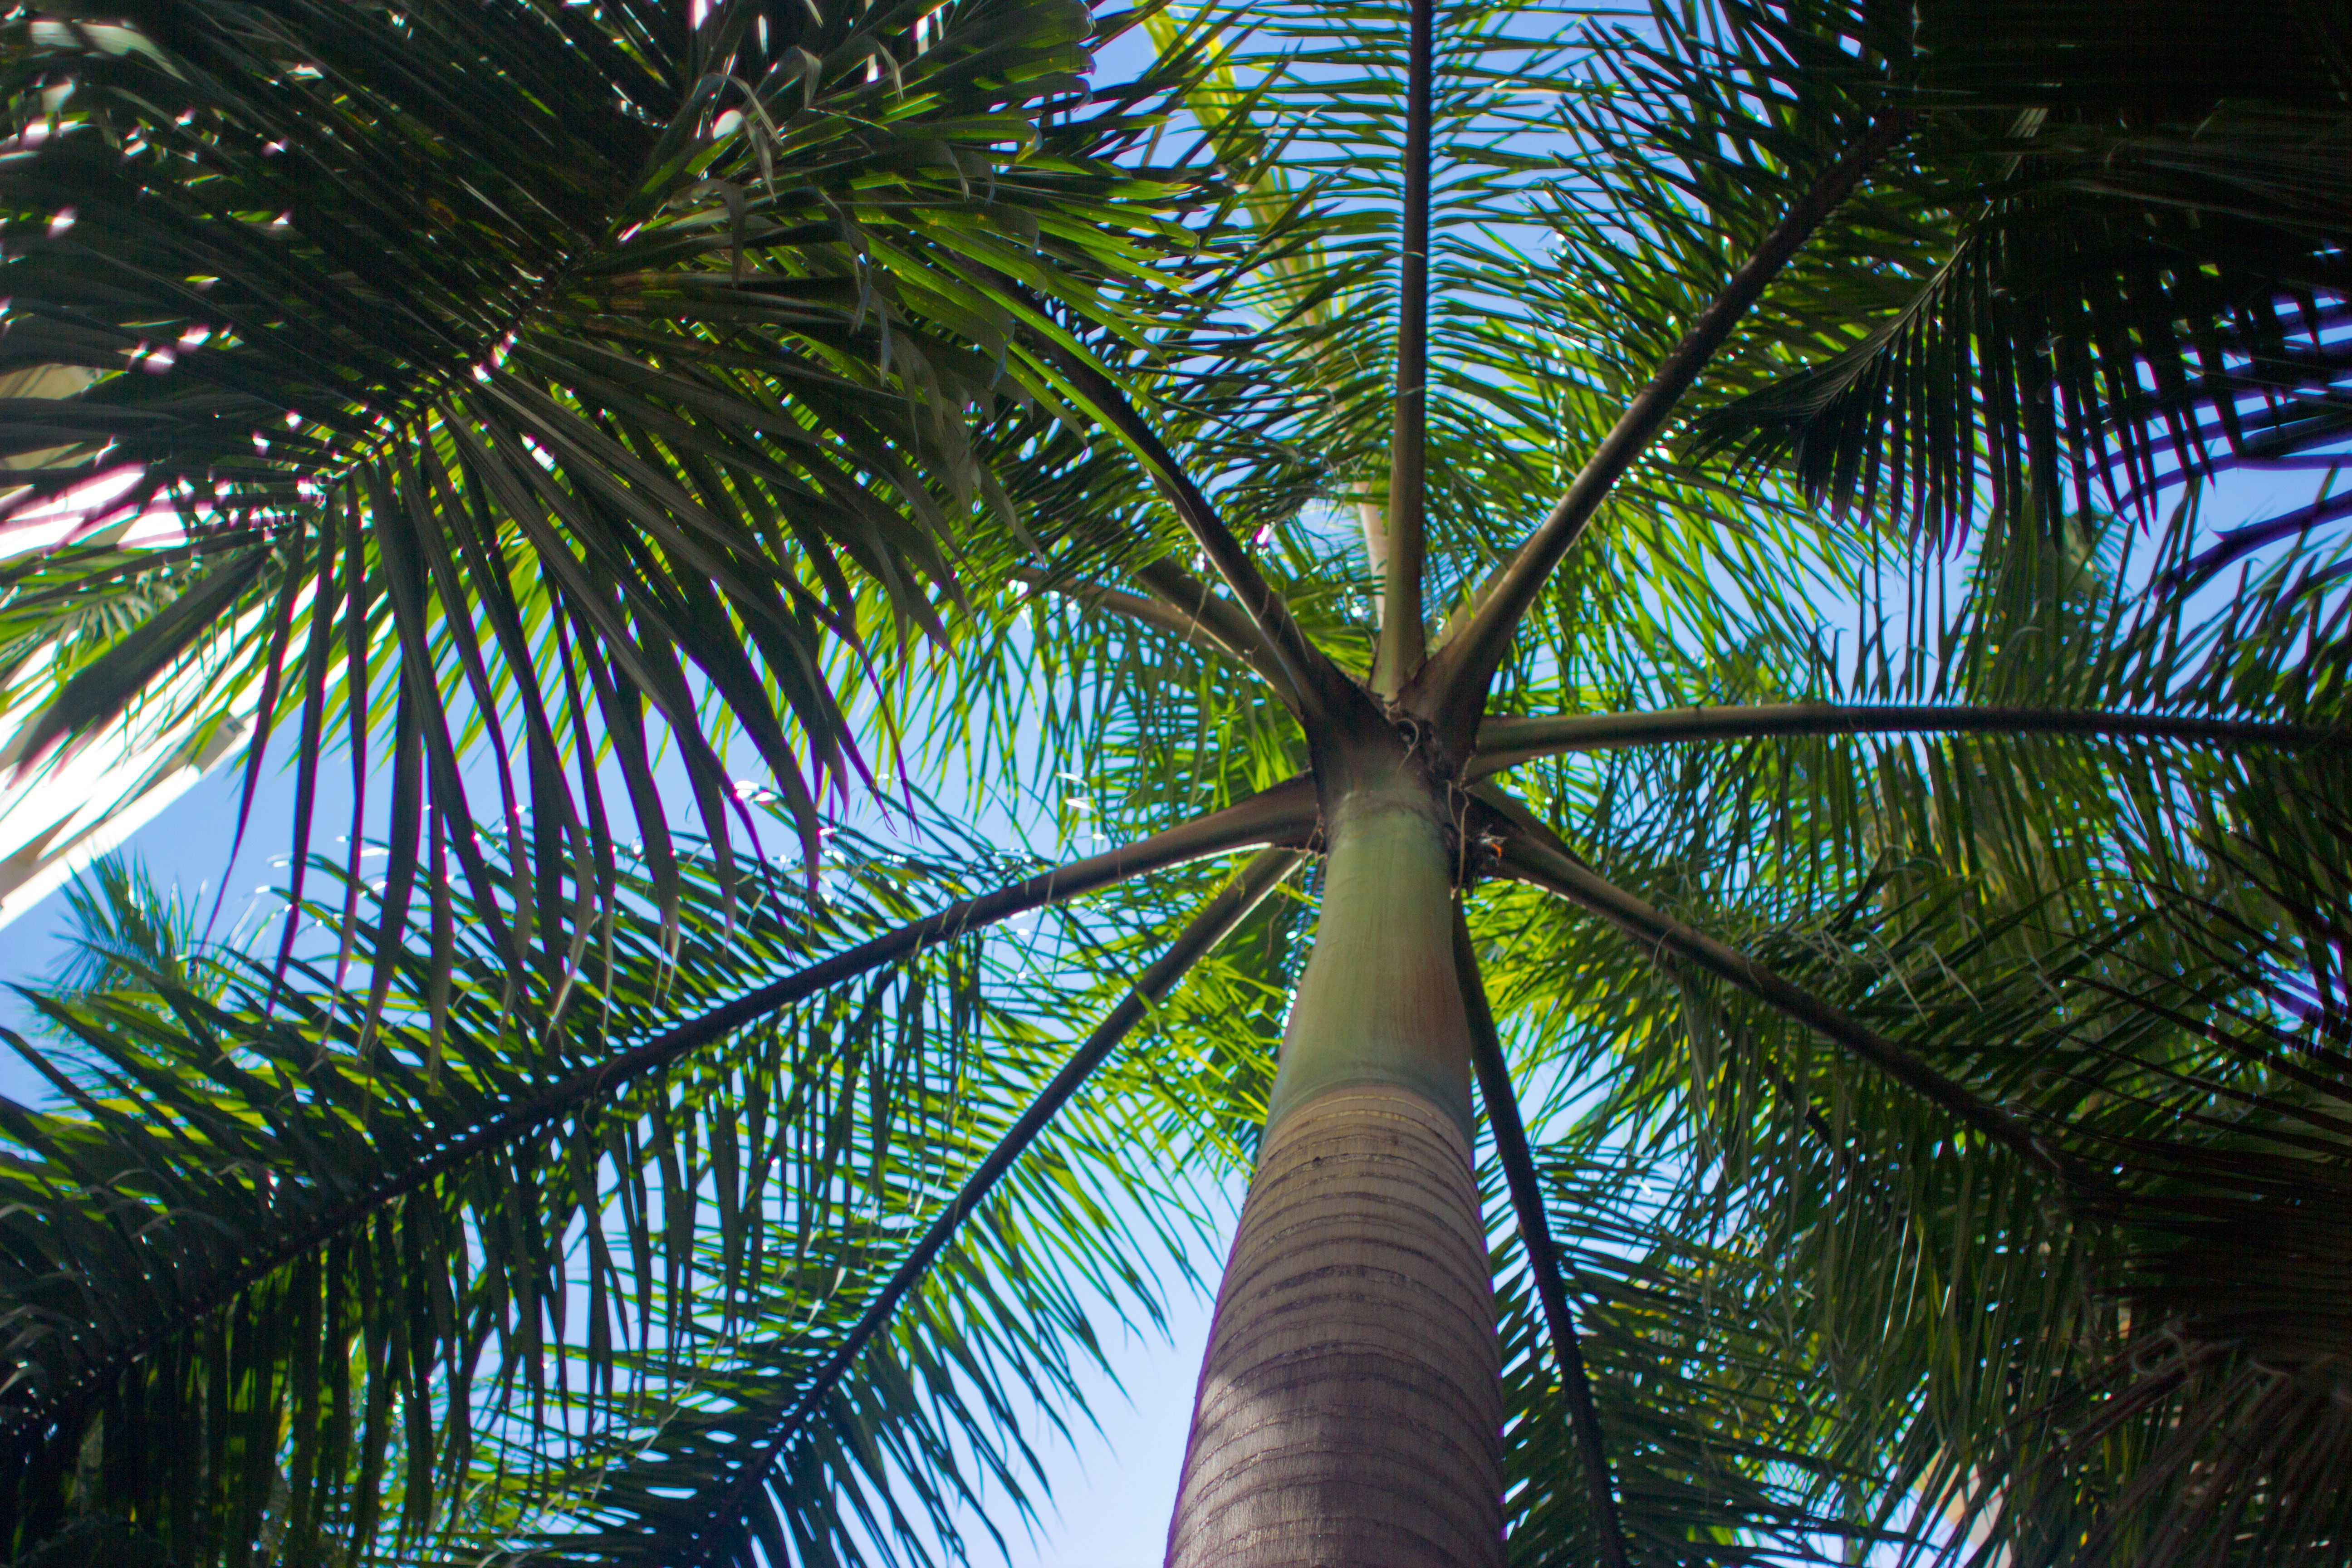 Types Of Palm Trees | File:Rio de Janeiro Palm Tree.jpg - Wikipedia, the free encyclopedia